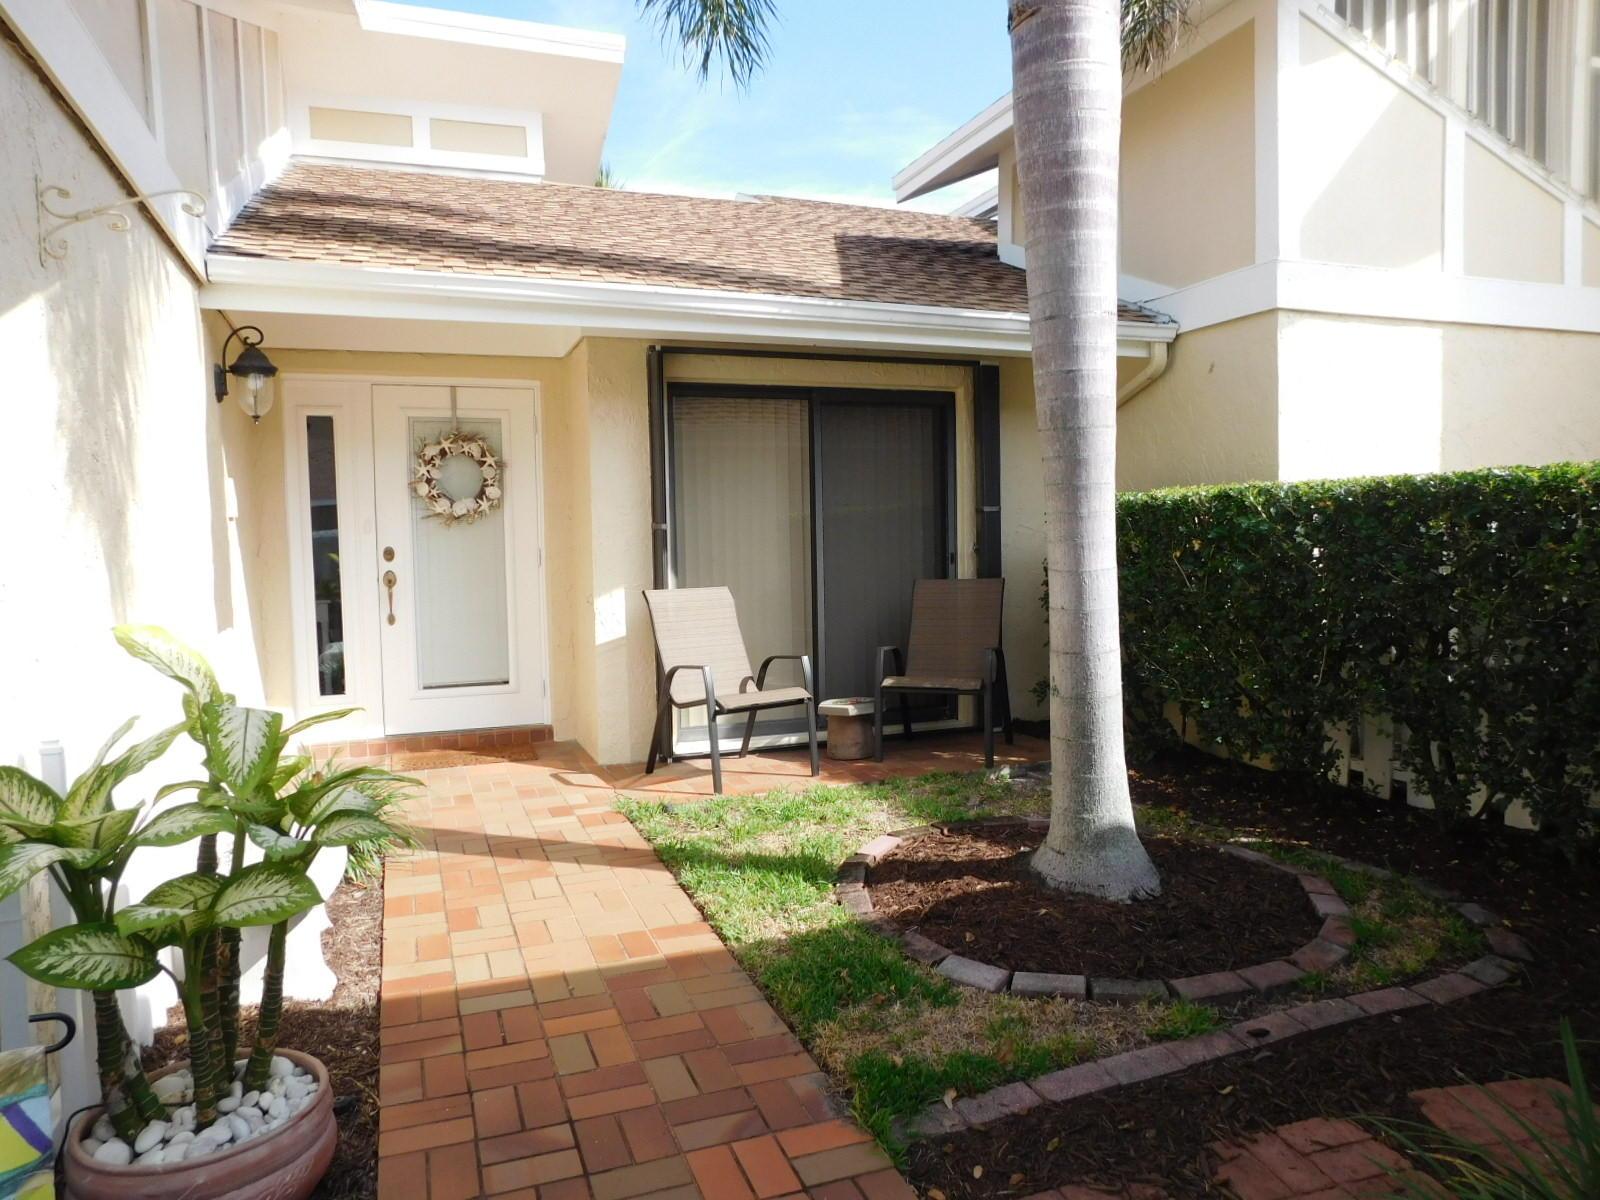 3805 Cape Pointe Circle, Jupiter, Florida 33477, 2 Bedrooms Bedrooms, ,2 BathroomsBathrooms,F,Townhouse,Cape Pointe,RX-10708526